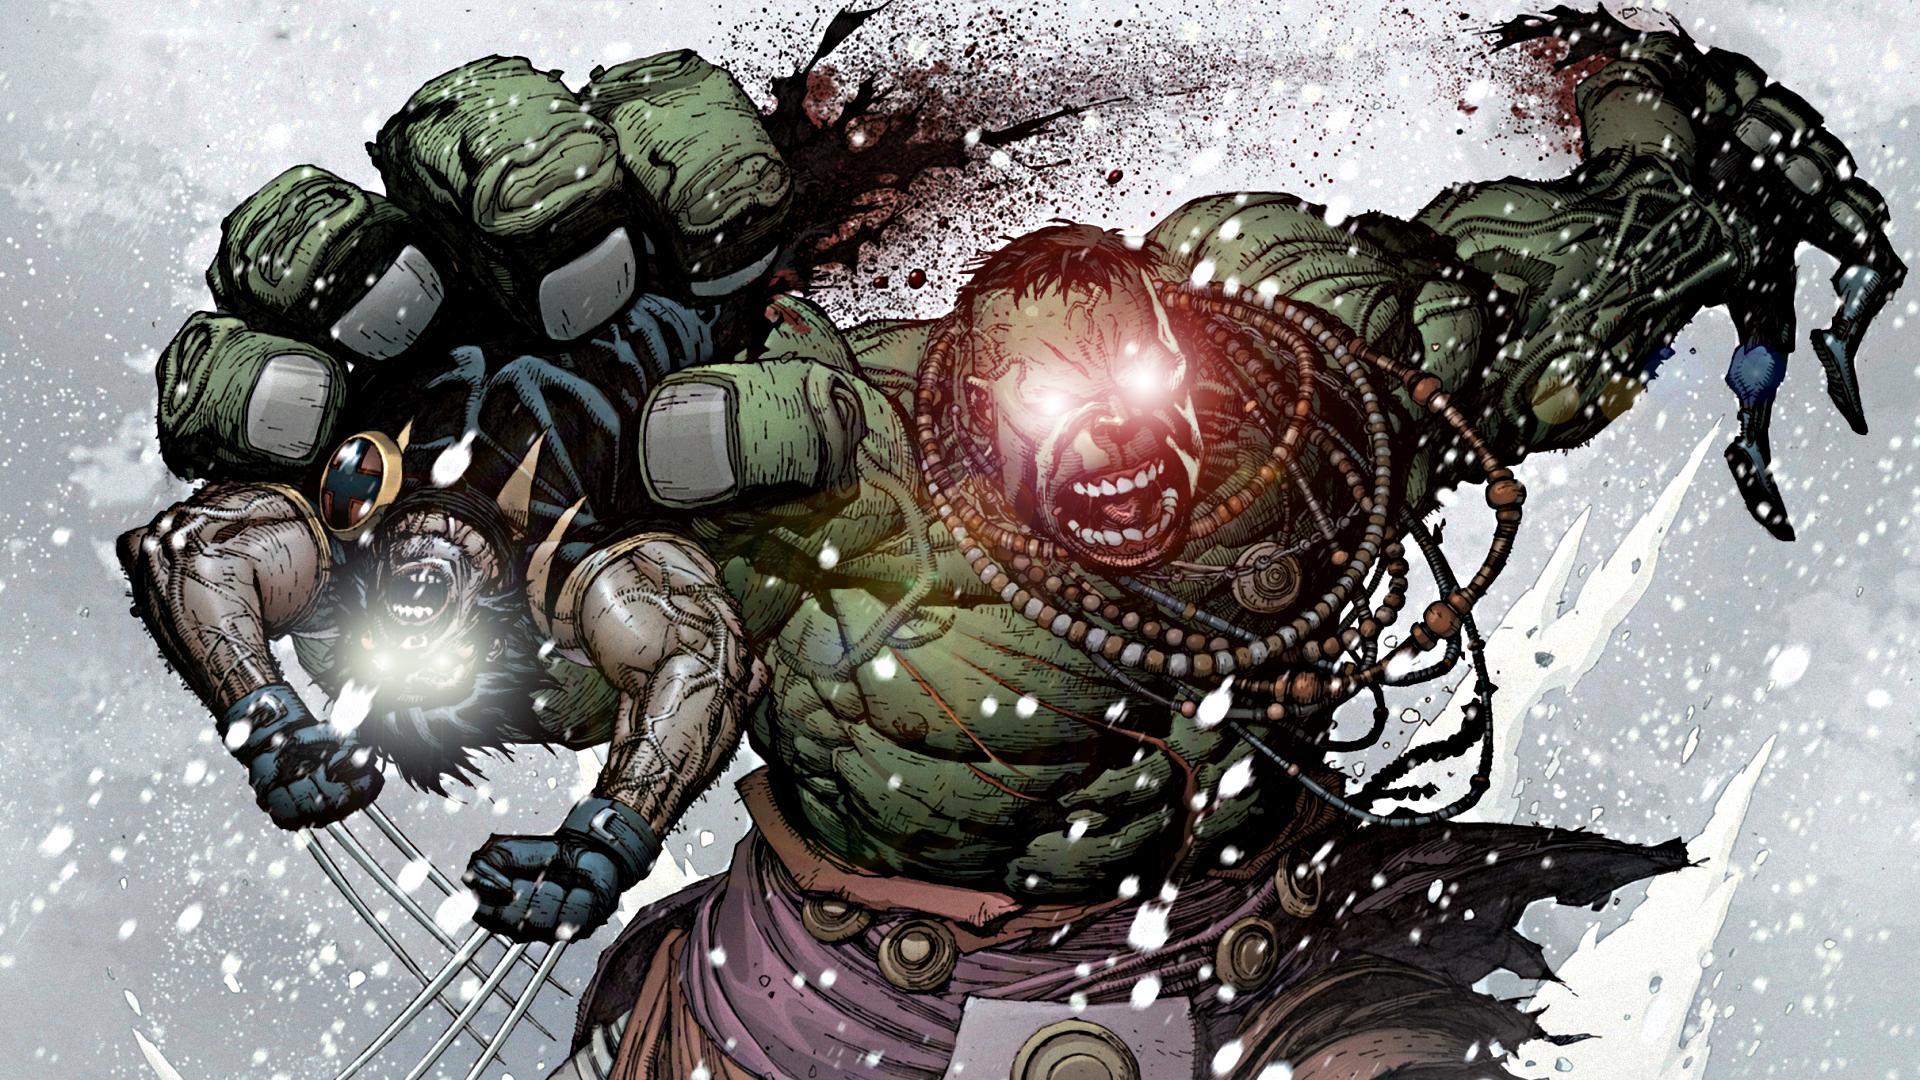 The Incredible Hulk Vs. The Wolverine by ProfessorAdagio